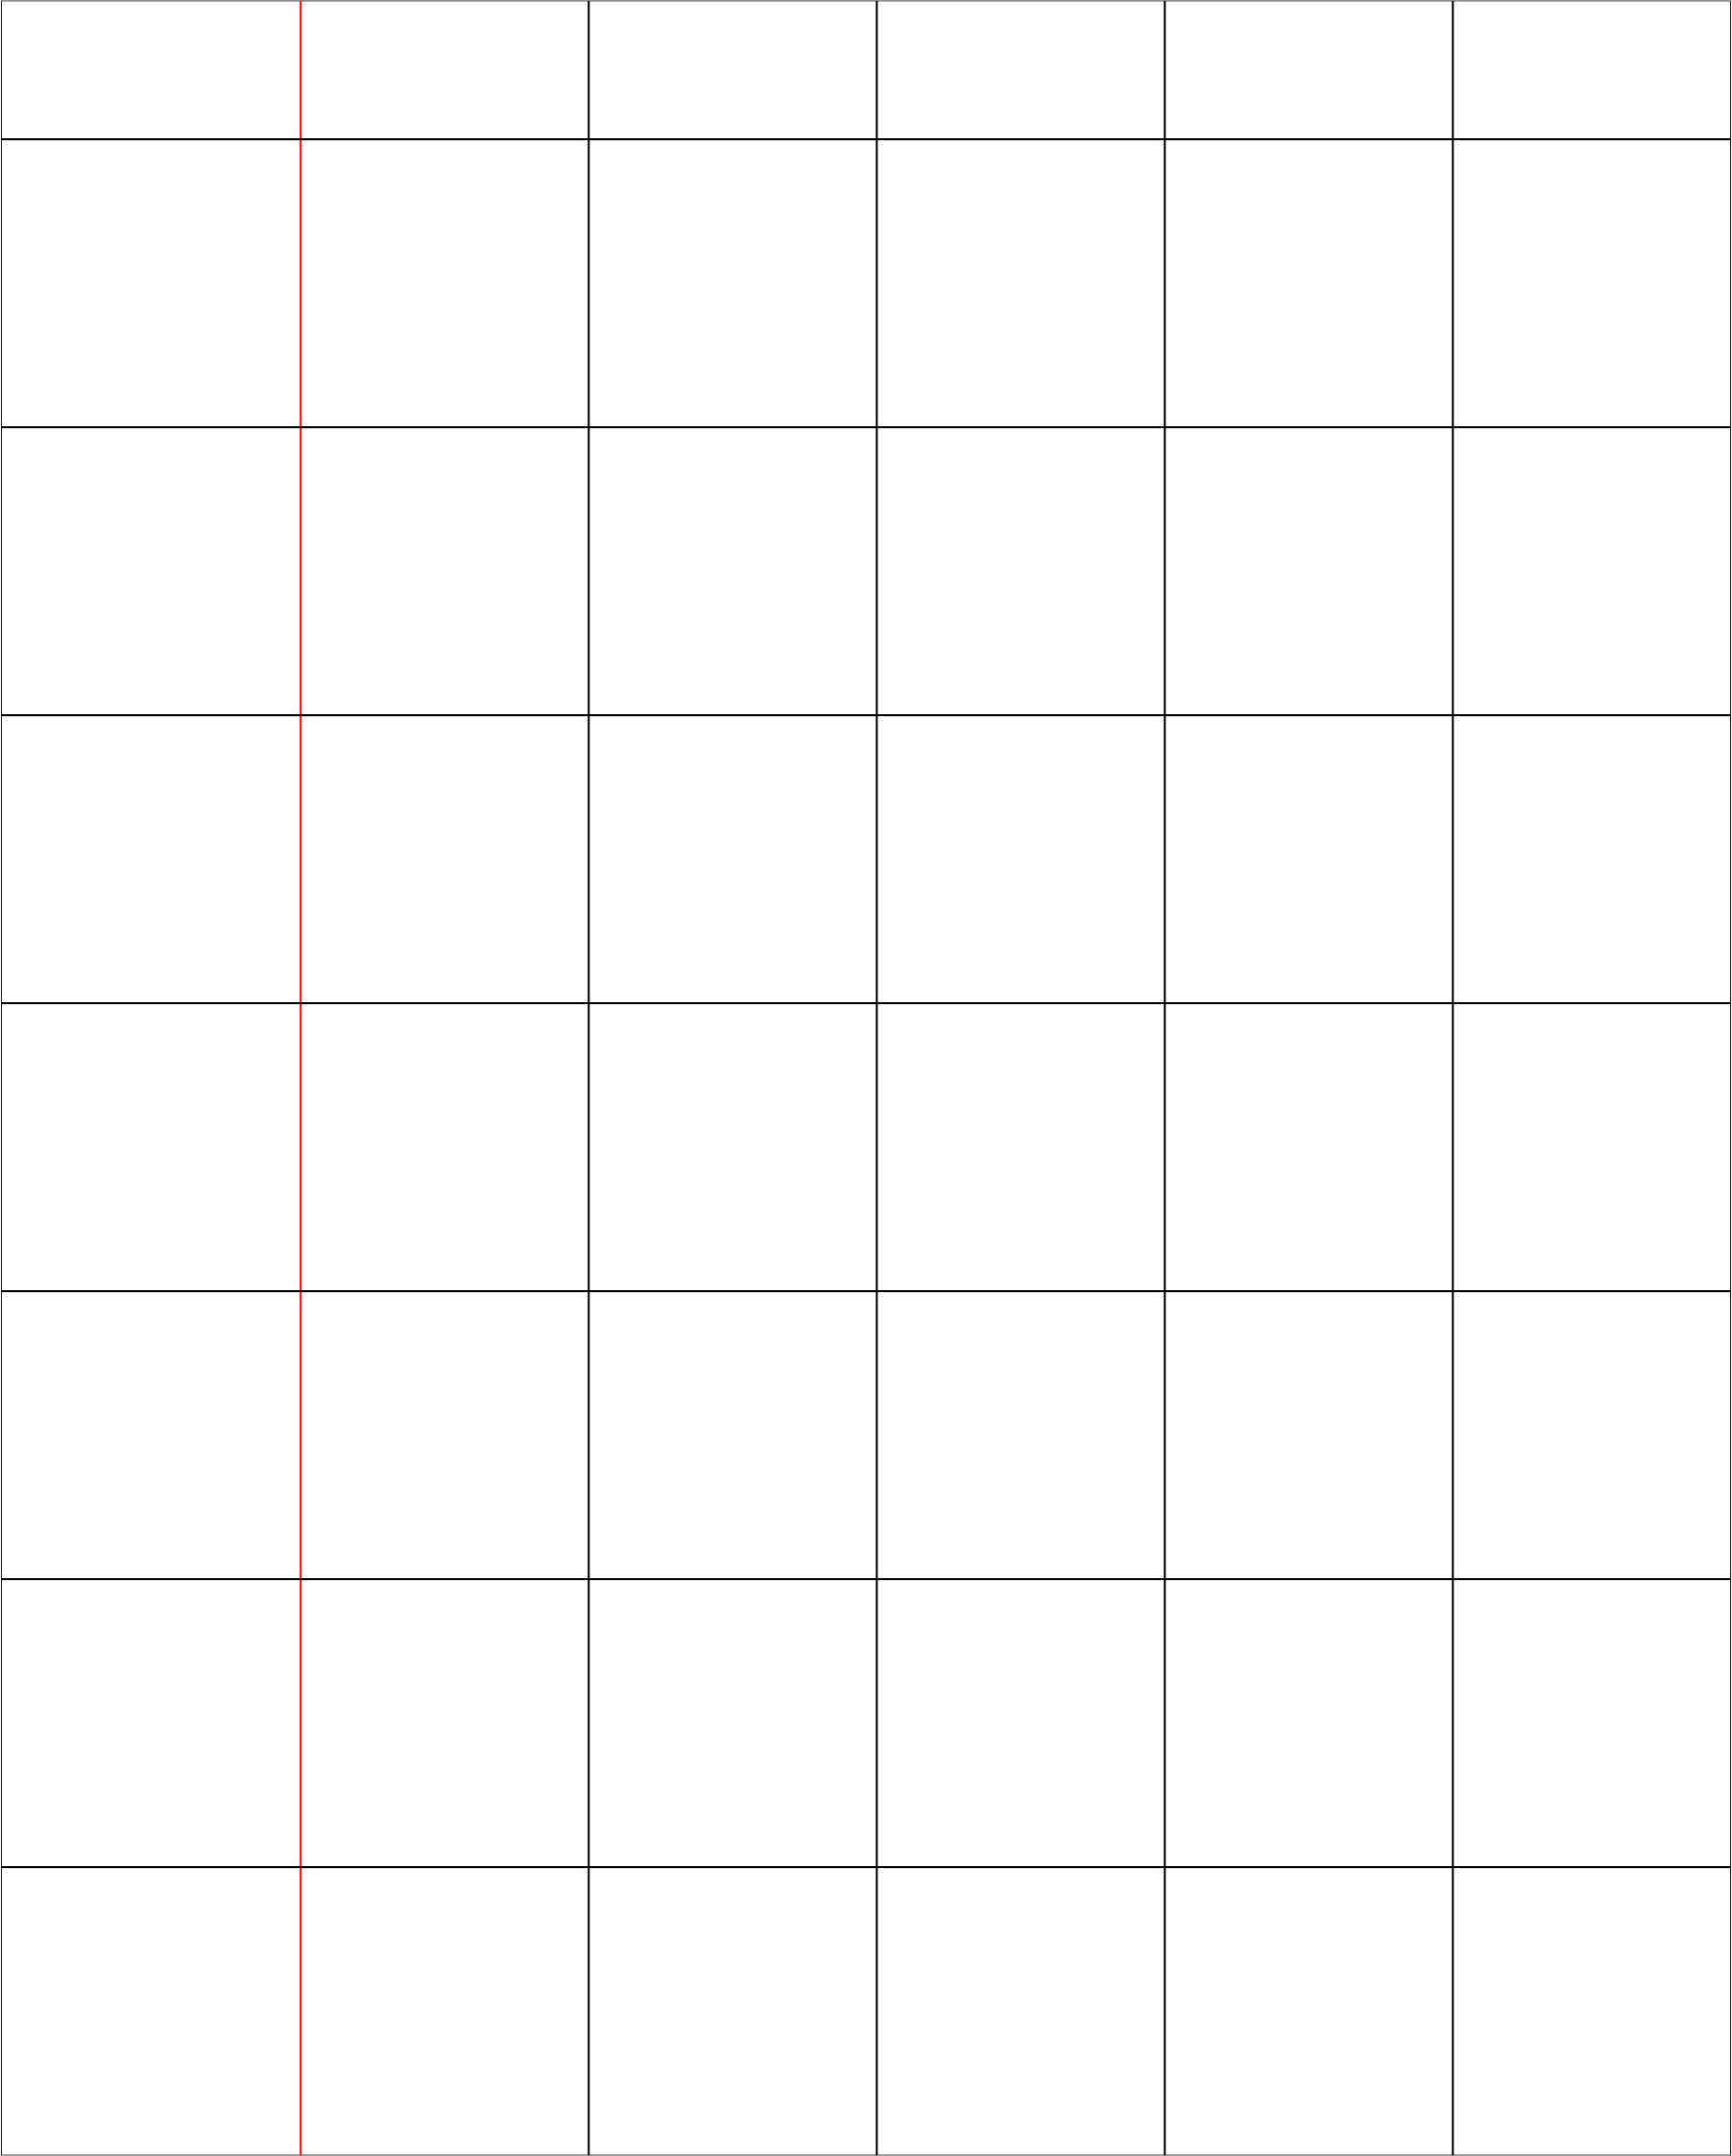 Sundaram Winner Brown Note Book (Big Square) - 76 Pages (E-7J)